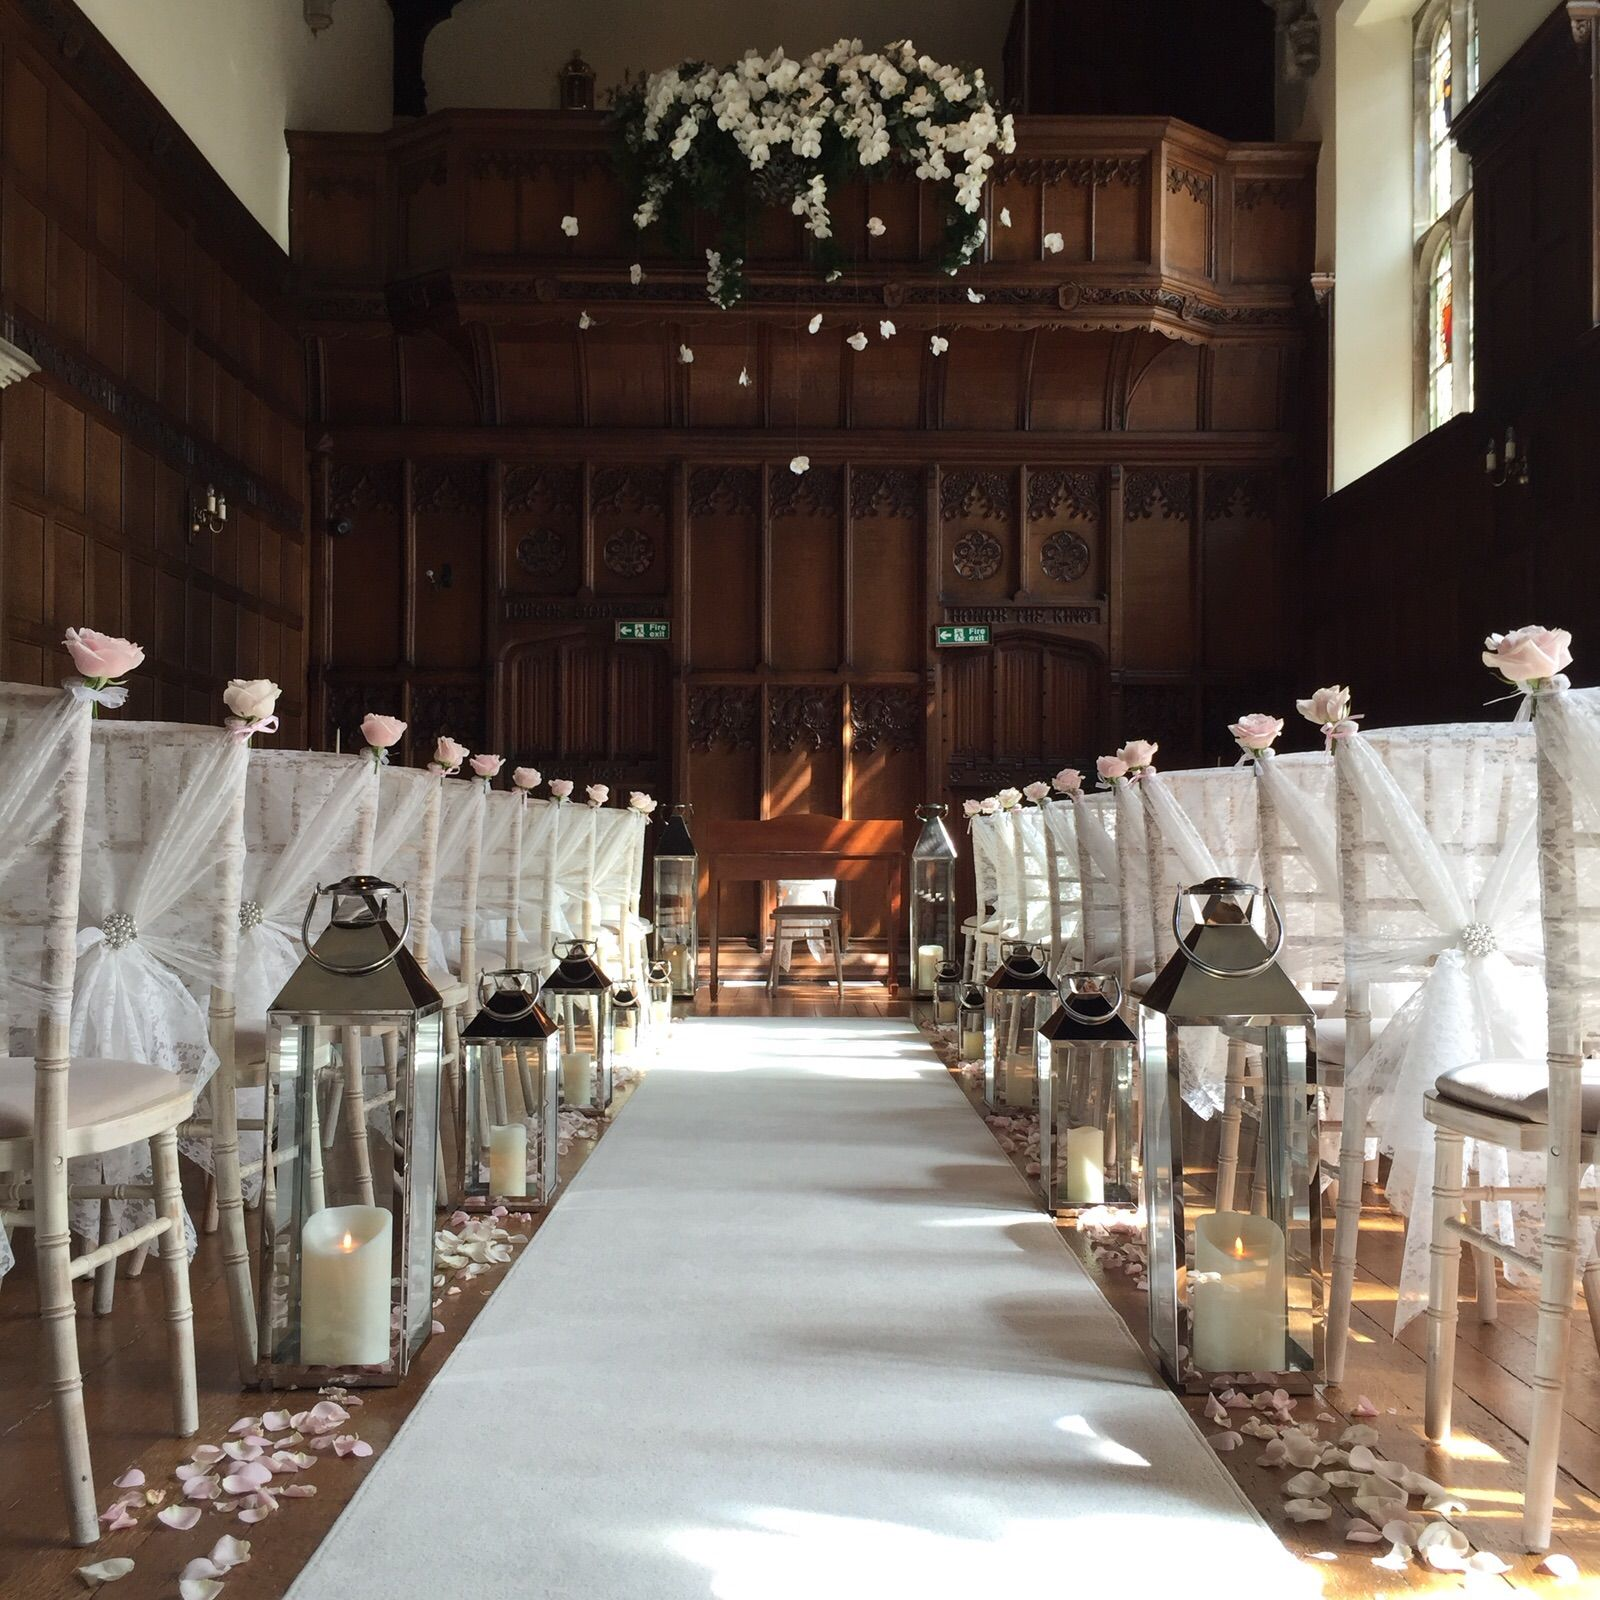 Civil Ceremony At Hengrave Hall, Suffolk Wedding Venue